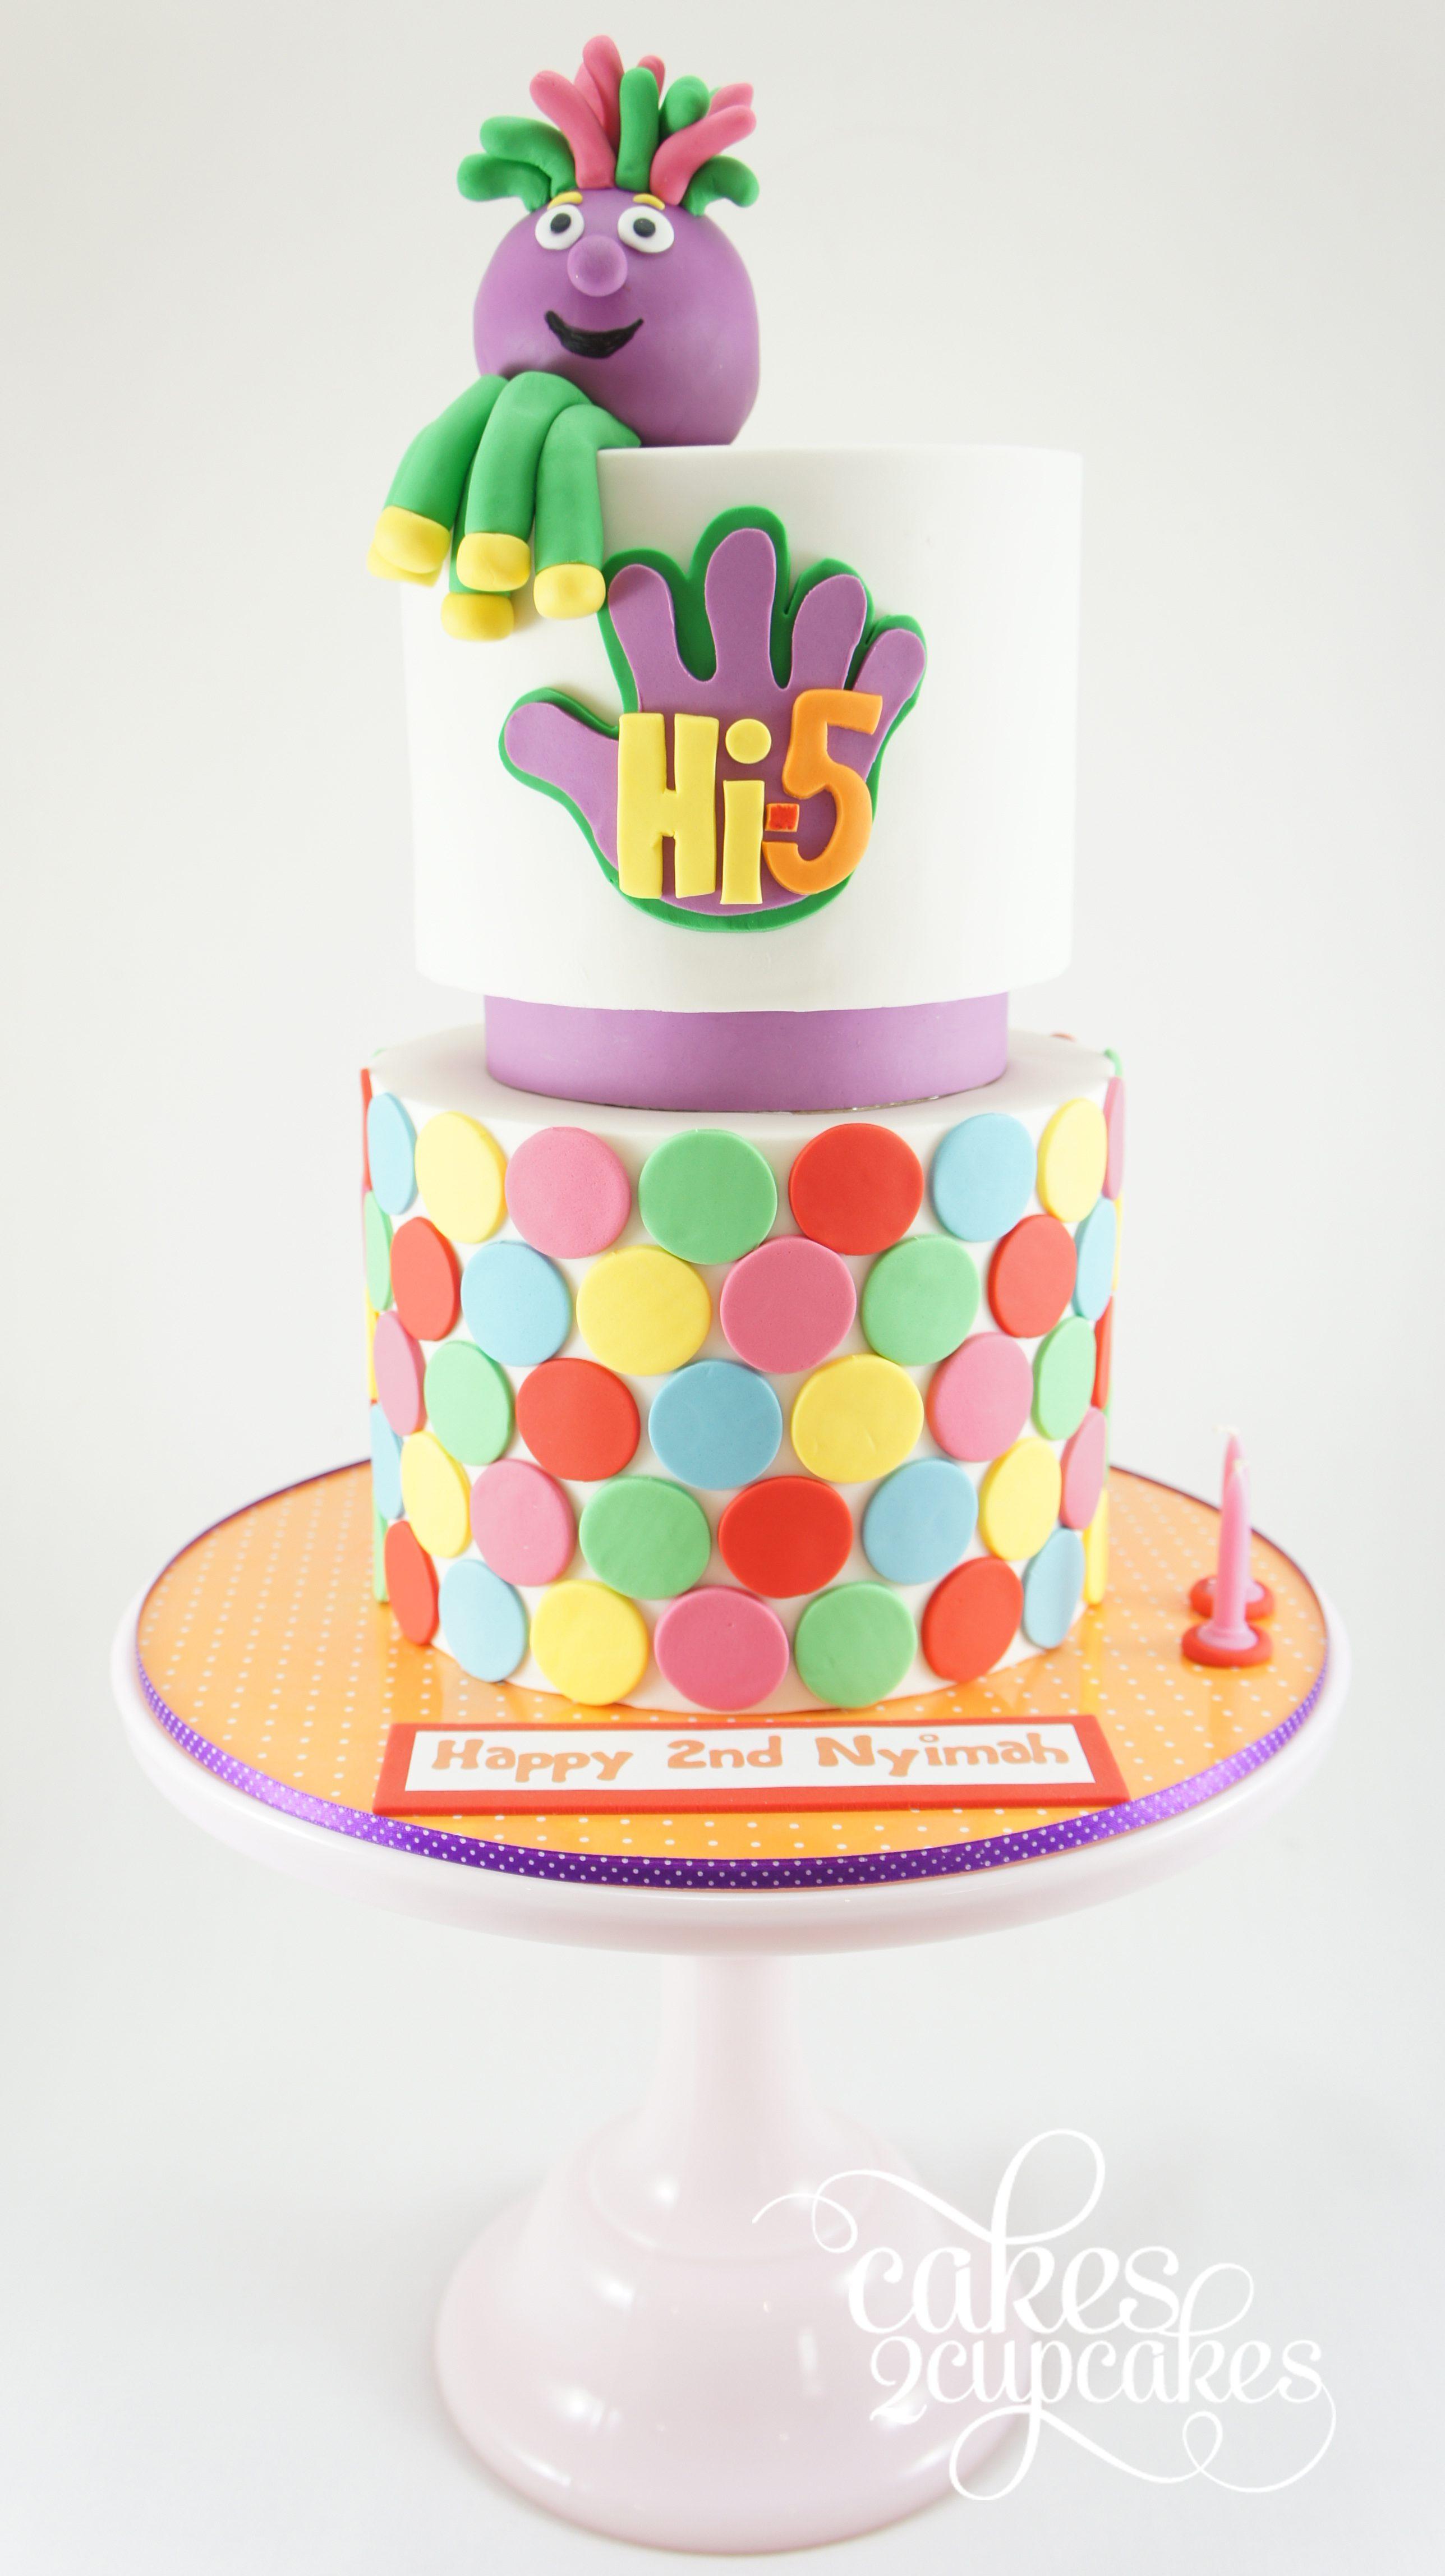 cakes2cupcakes-Hi-5 cake.jpg